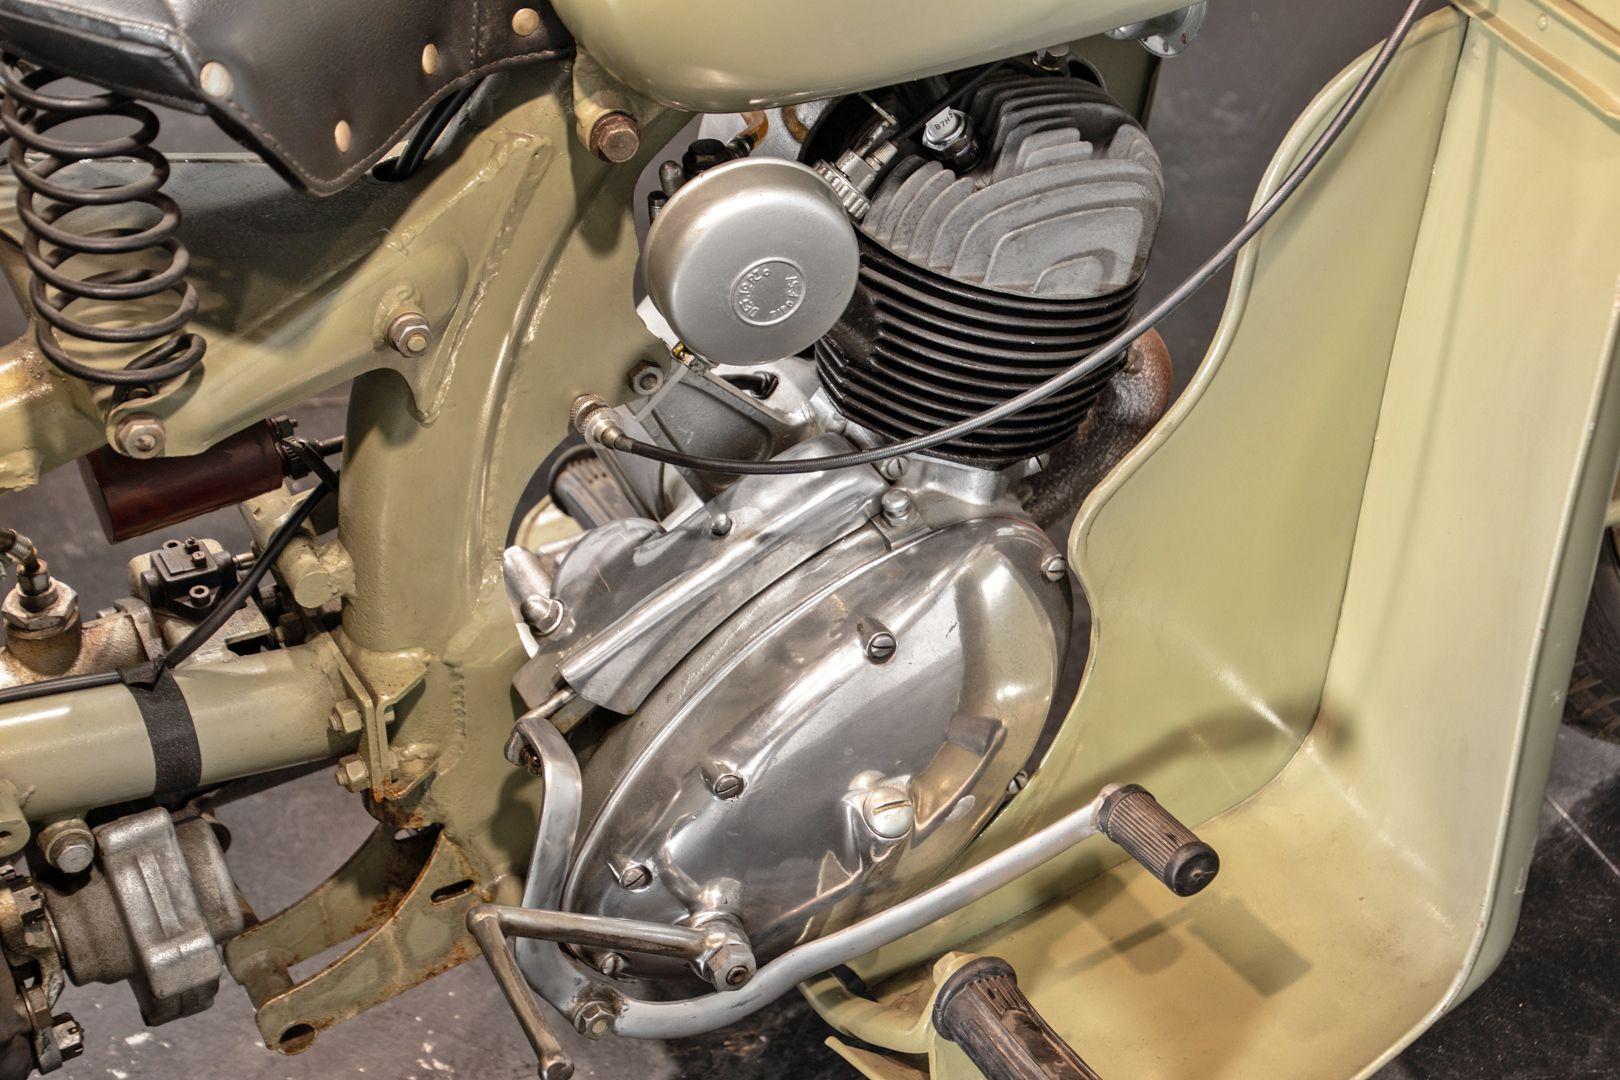 1956 Benelli 125 Leoncino Rikshaws 74334